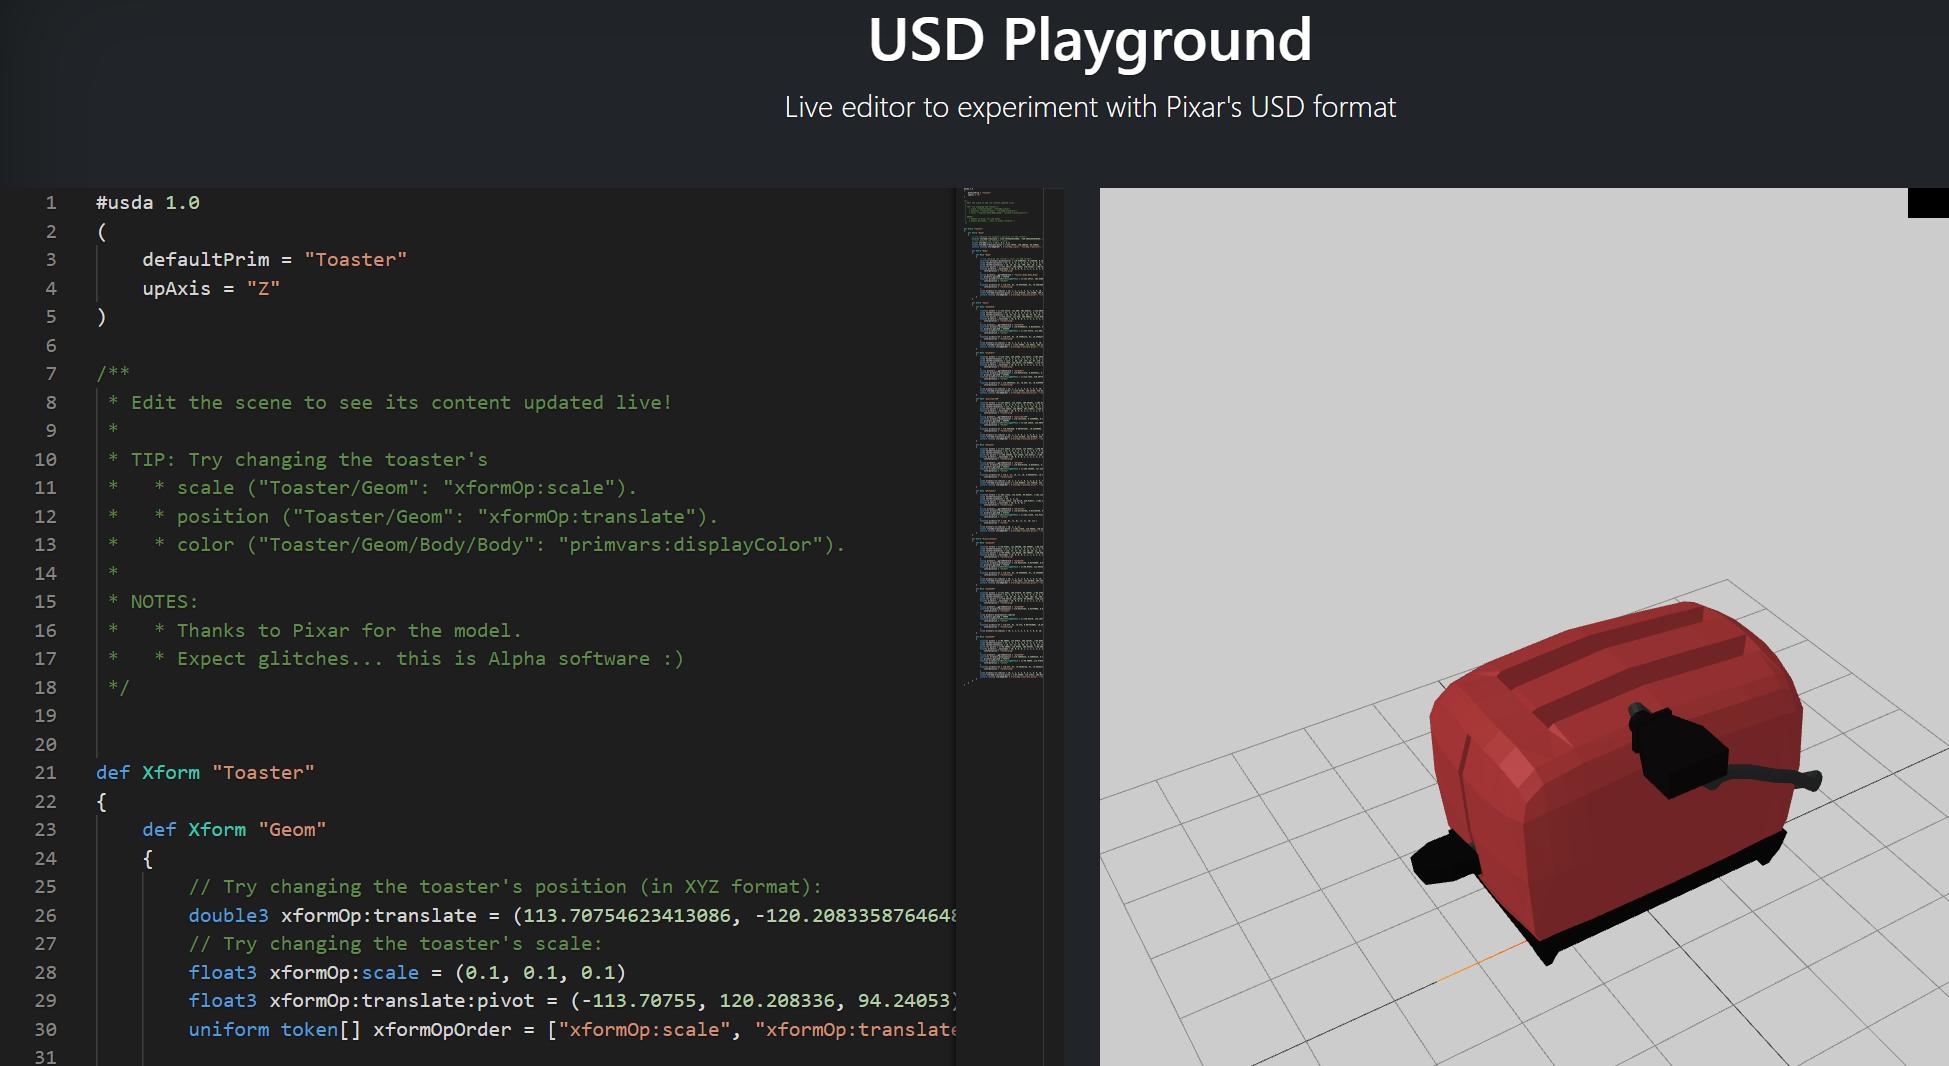 USD Playground